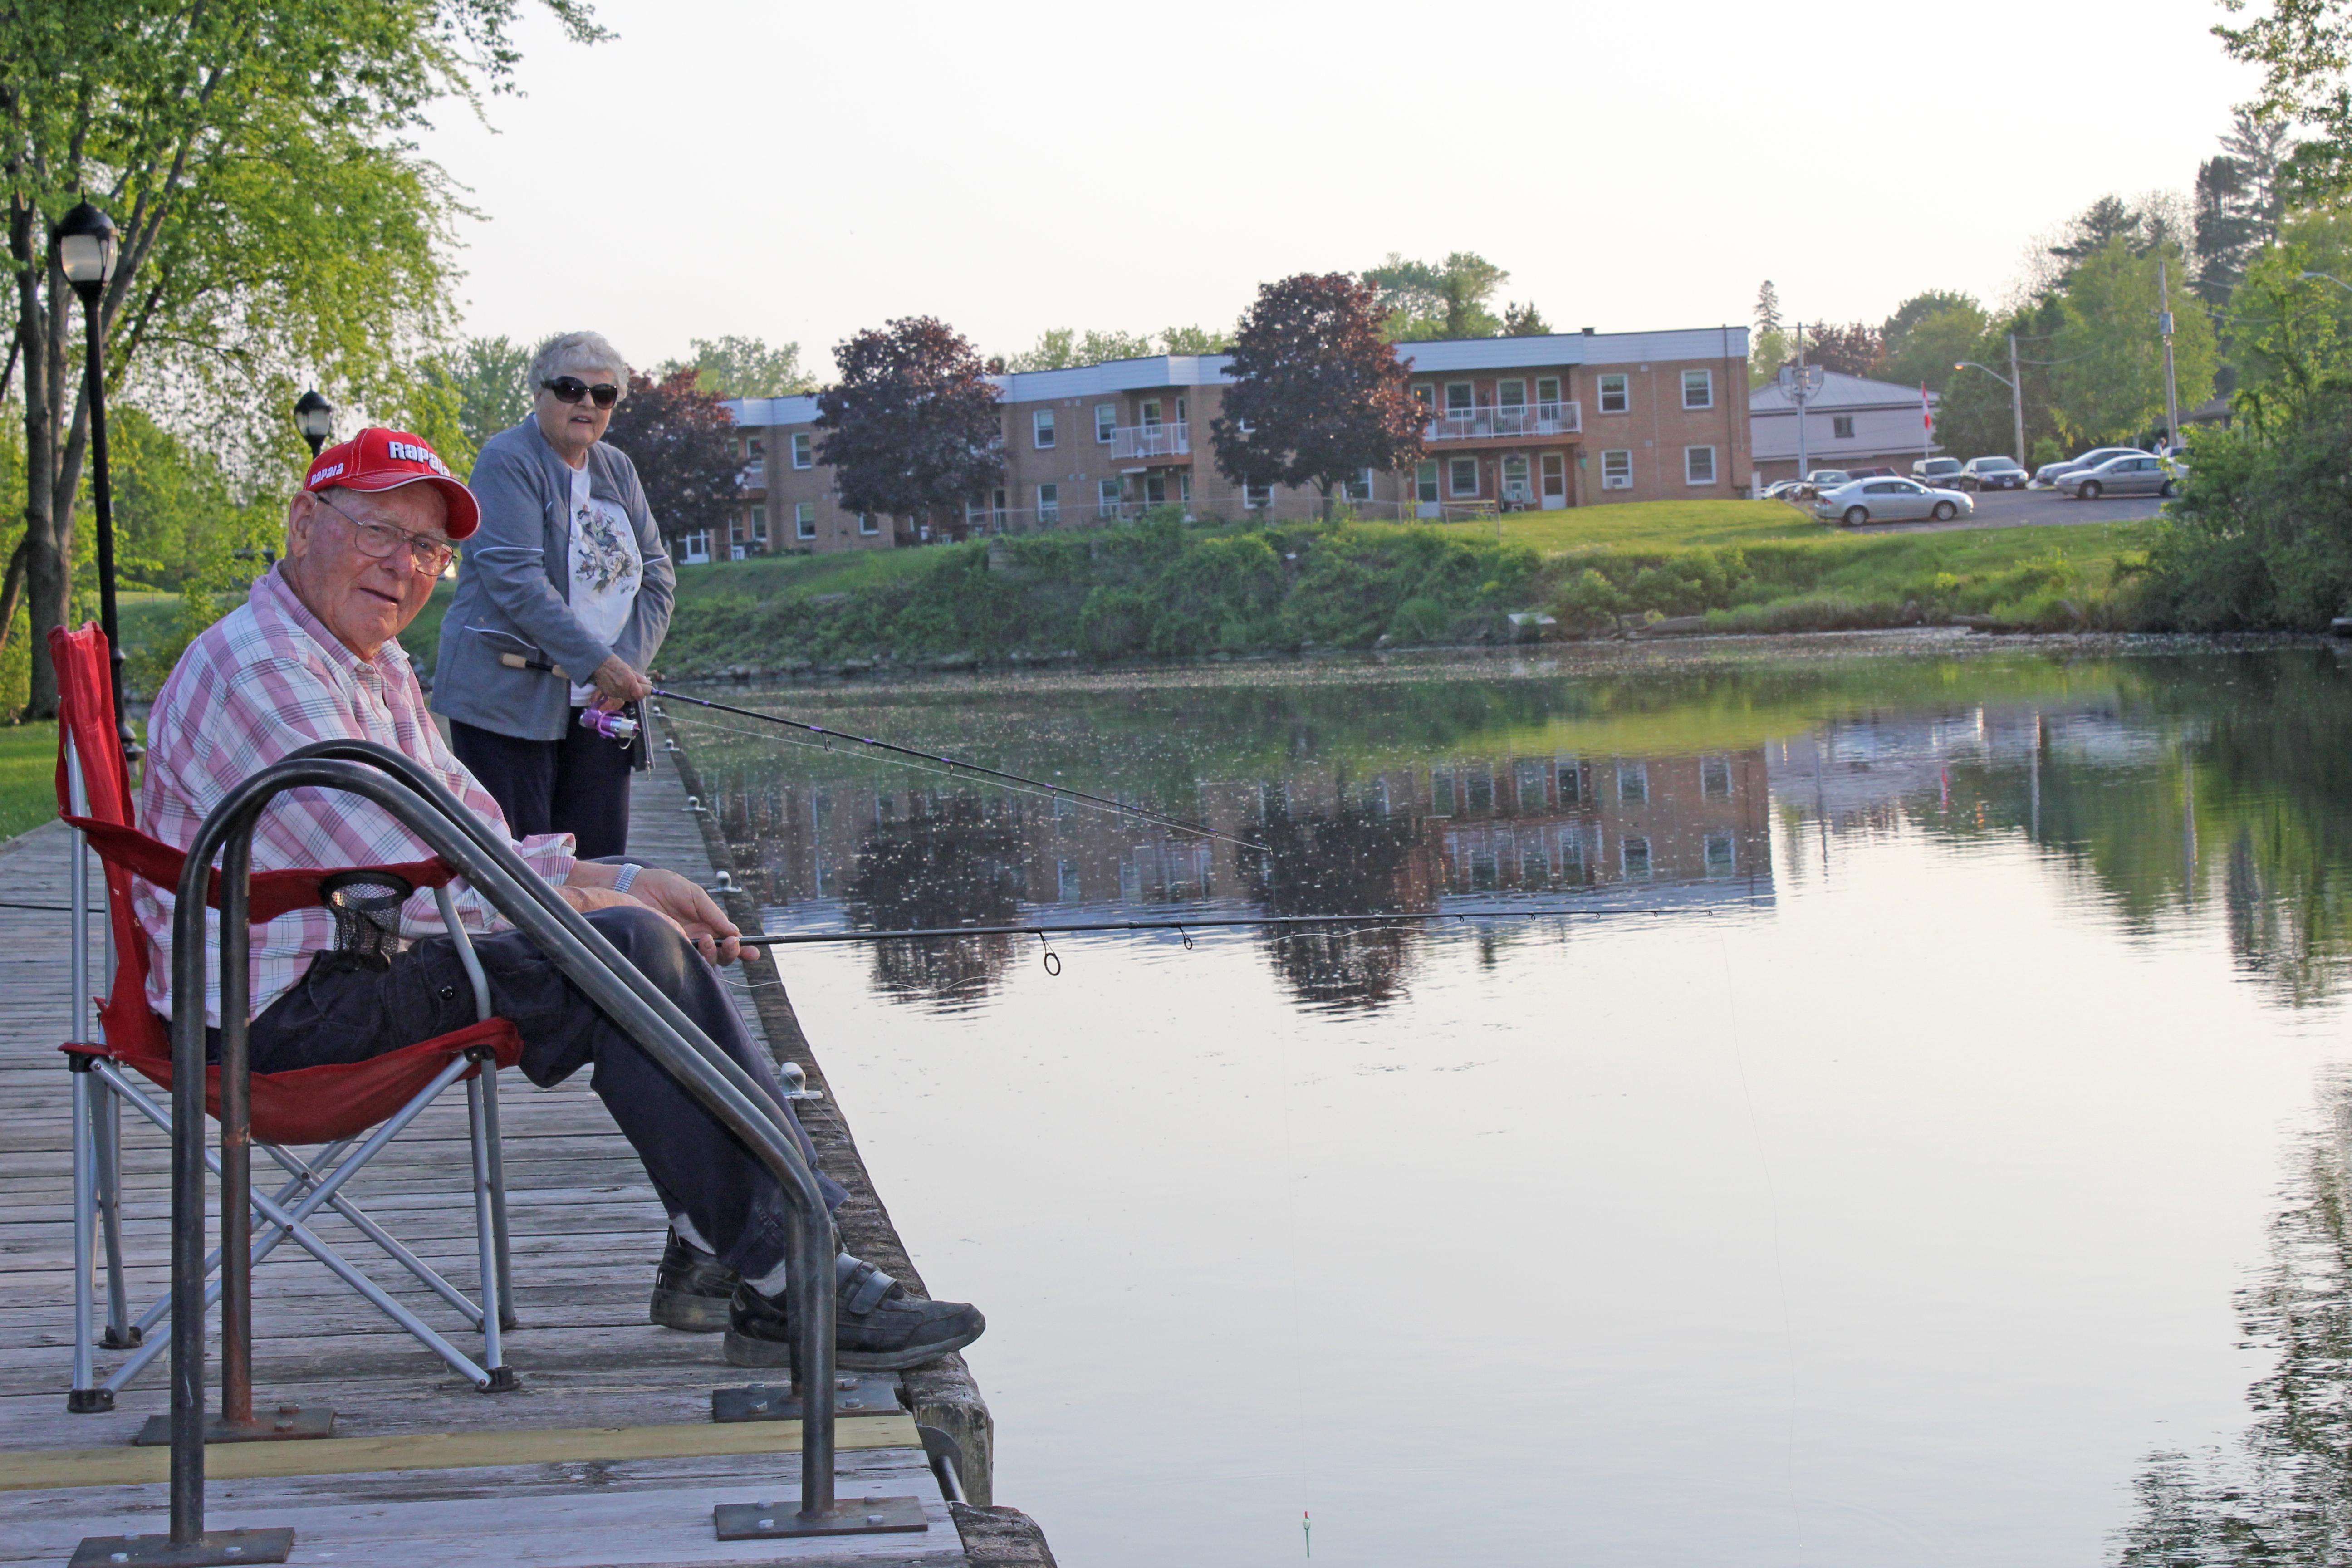 grandma and grandpa fishing